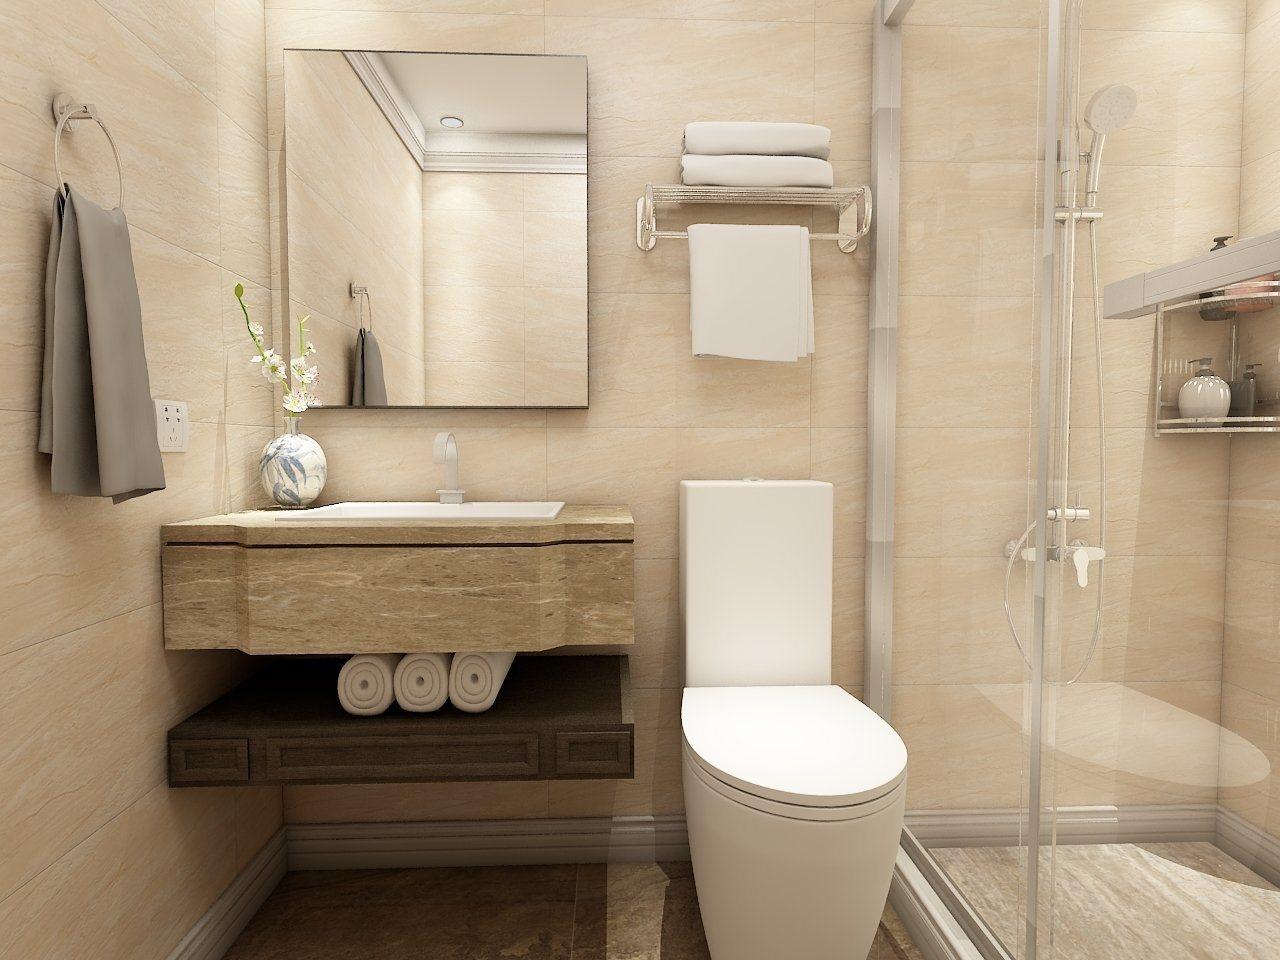 China Prefab Bathroom Set With Shower Enclosure For Hotel China Bathroom Toilet